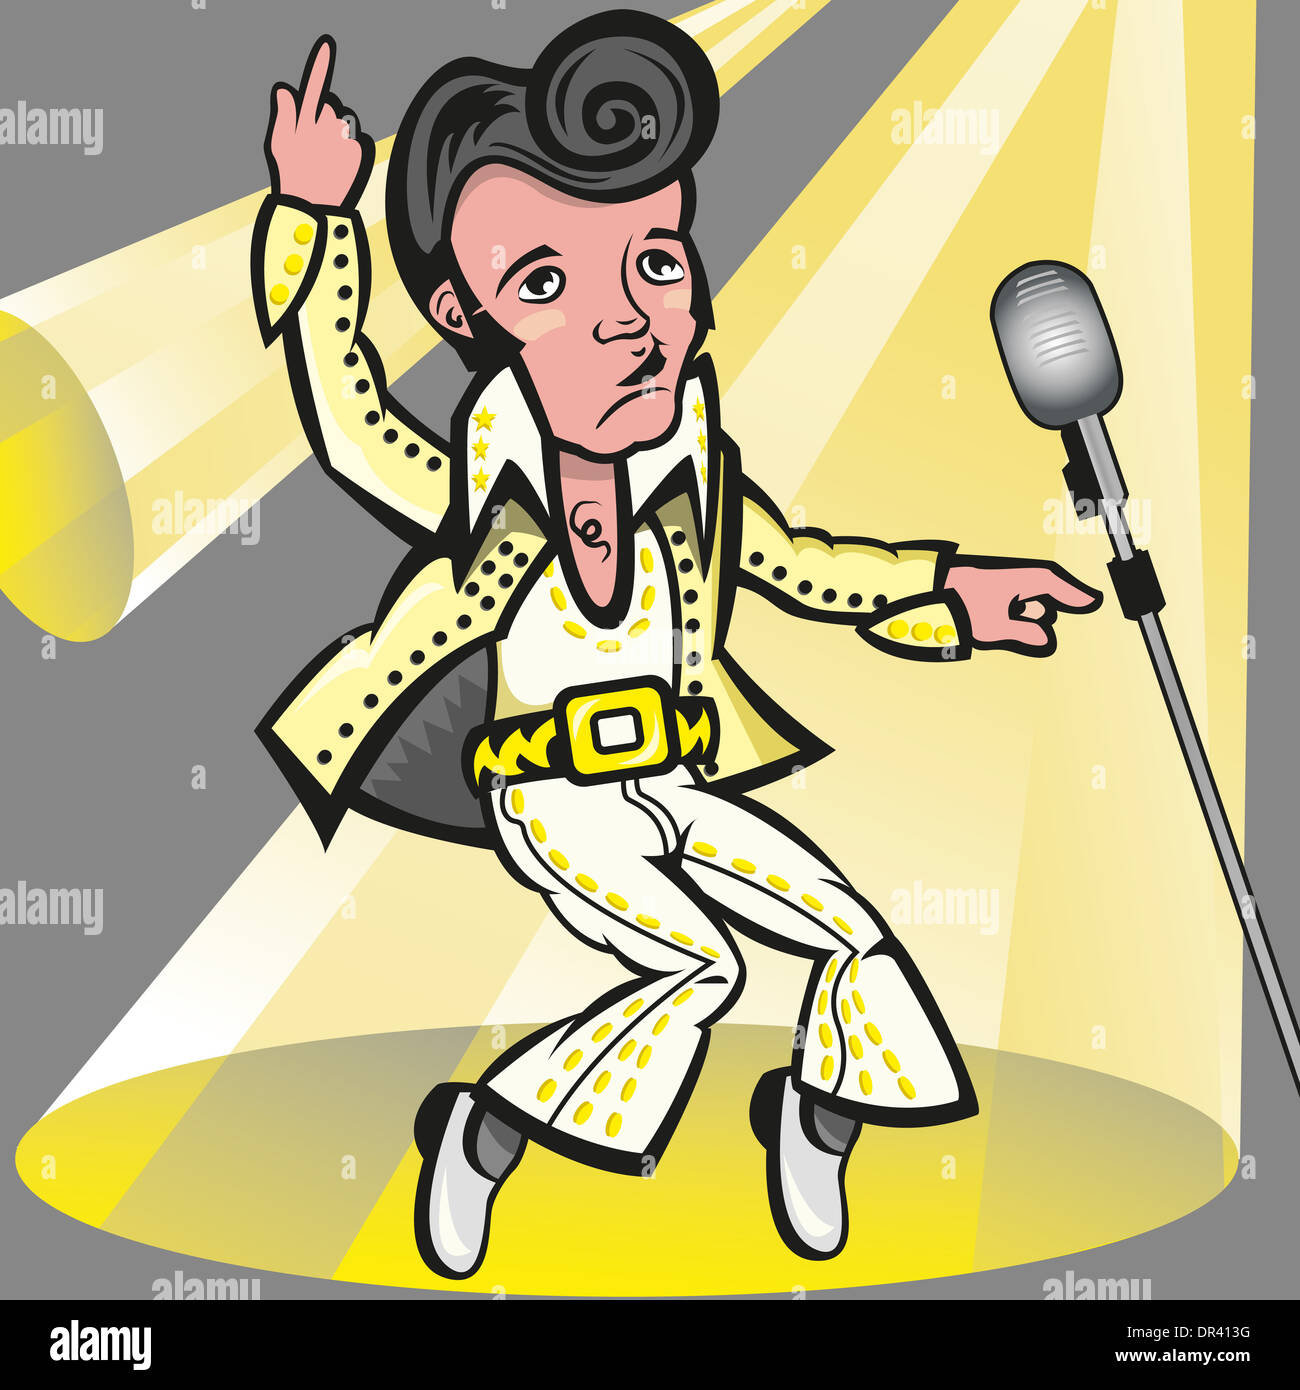 Illustration Elvis Presley Stock Photos & Illustration Elvis Presley ...